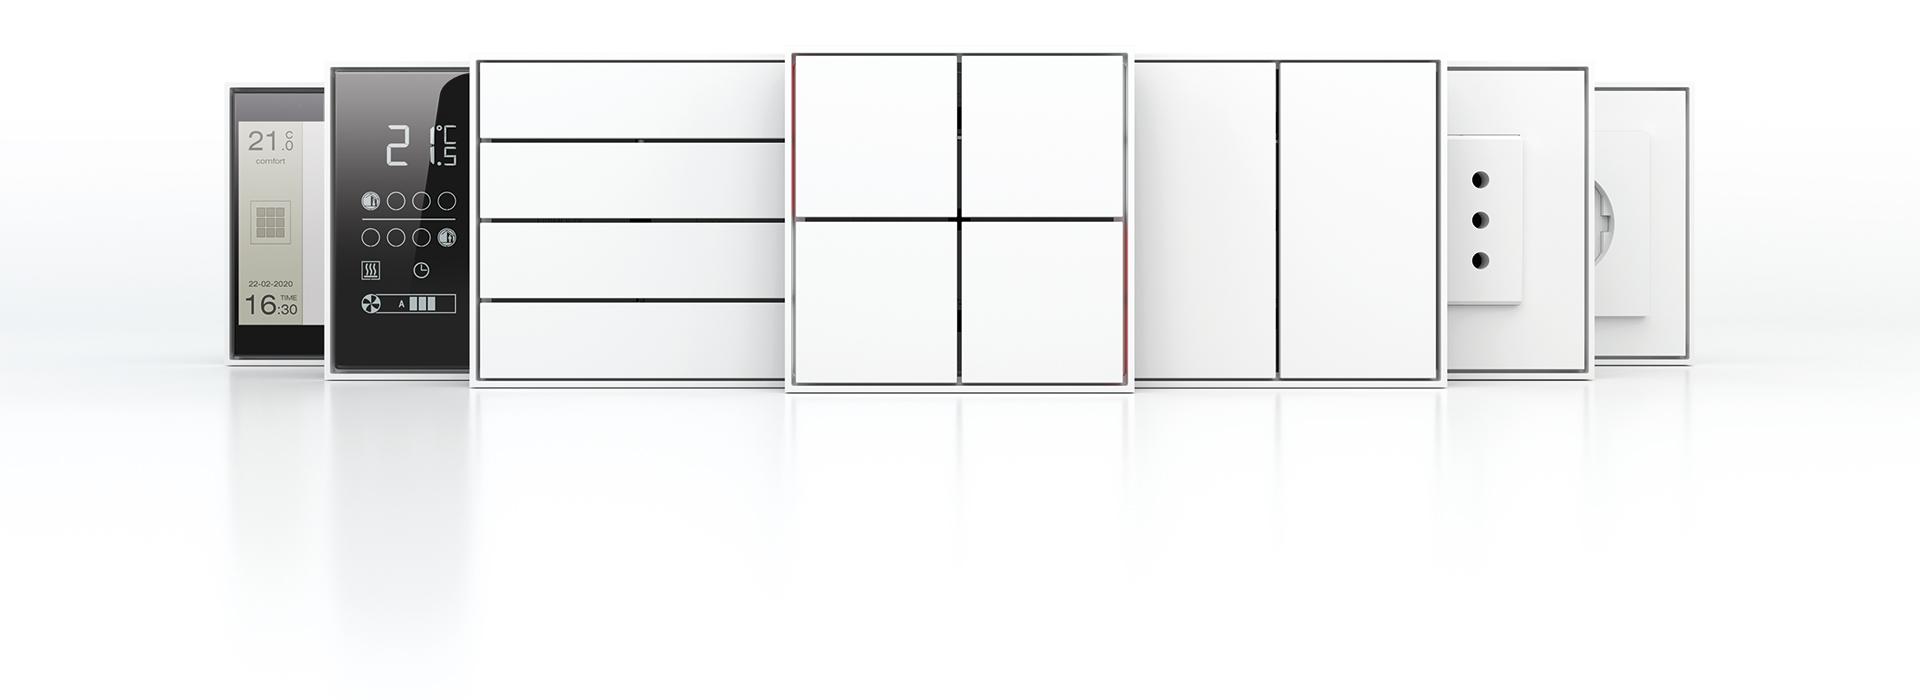 FF series - Form